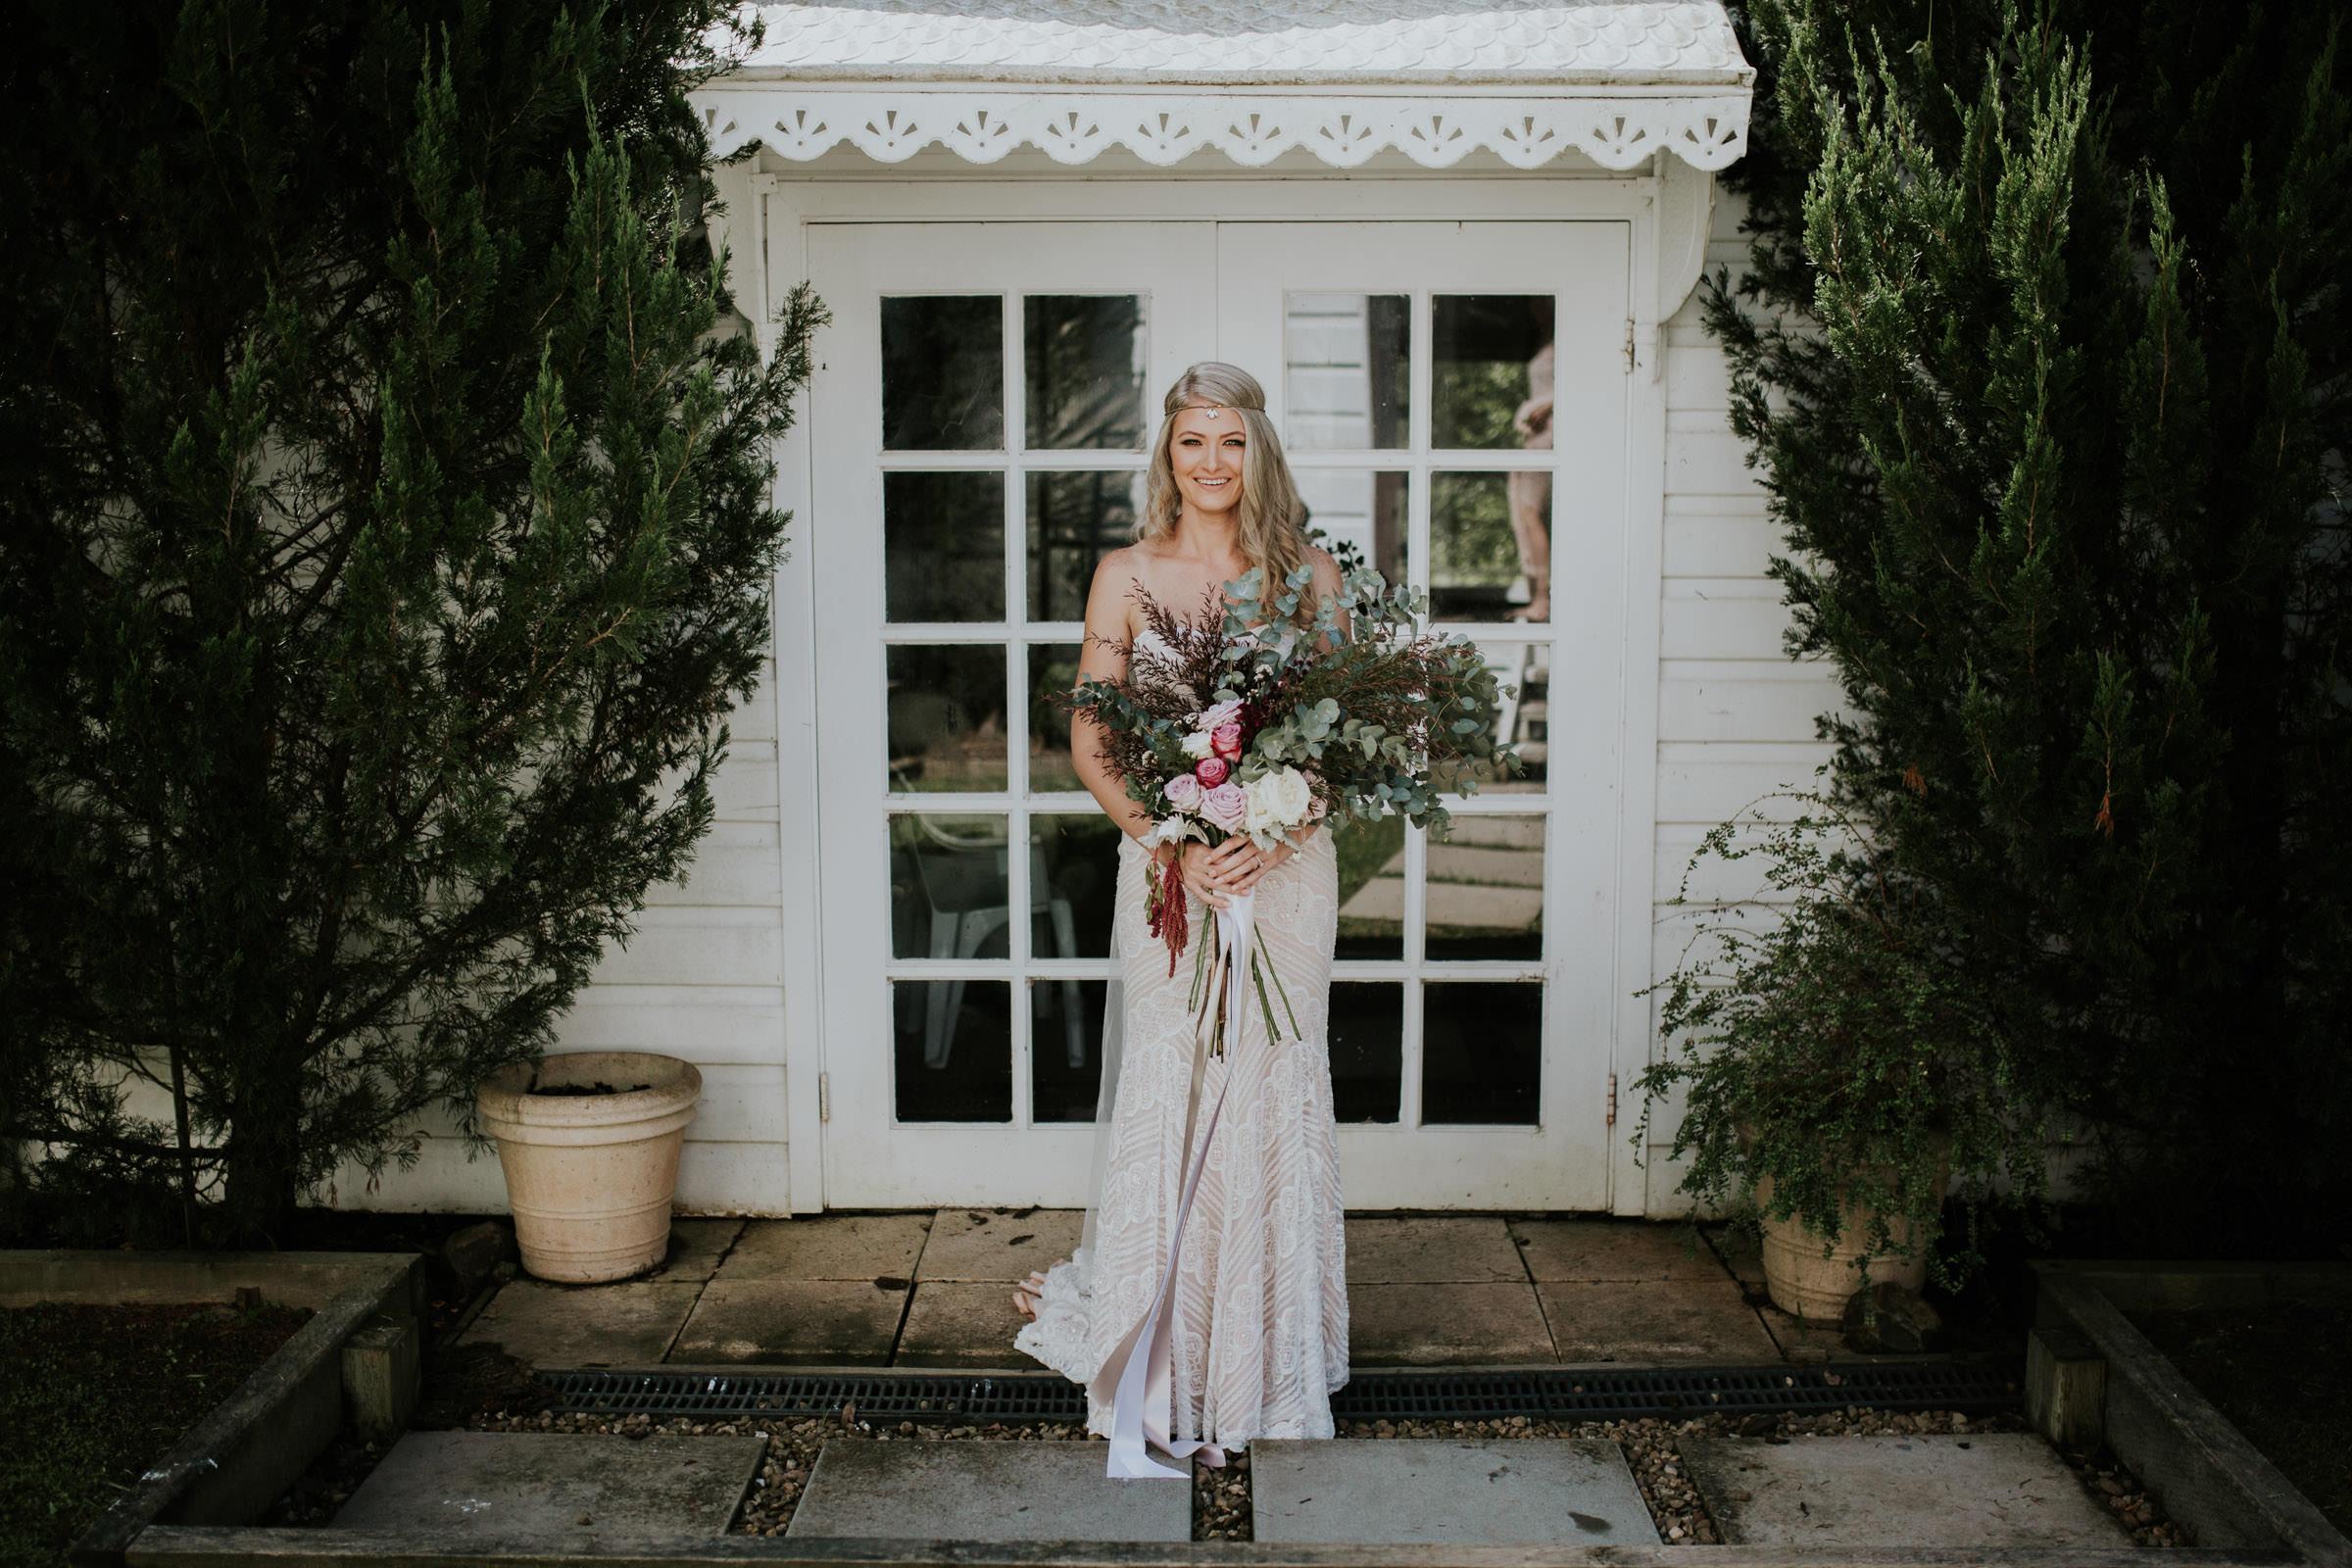 Emma+John+Far+South+Coast+Wedding+Festivl+Glamping+Bush-62.jpg